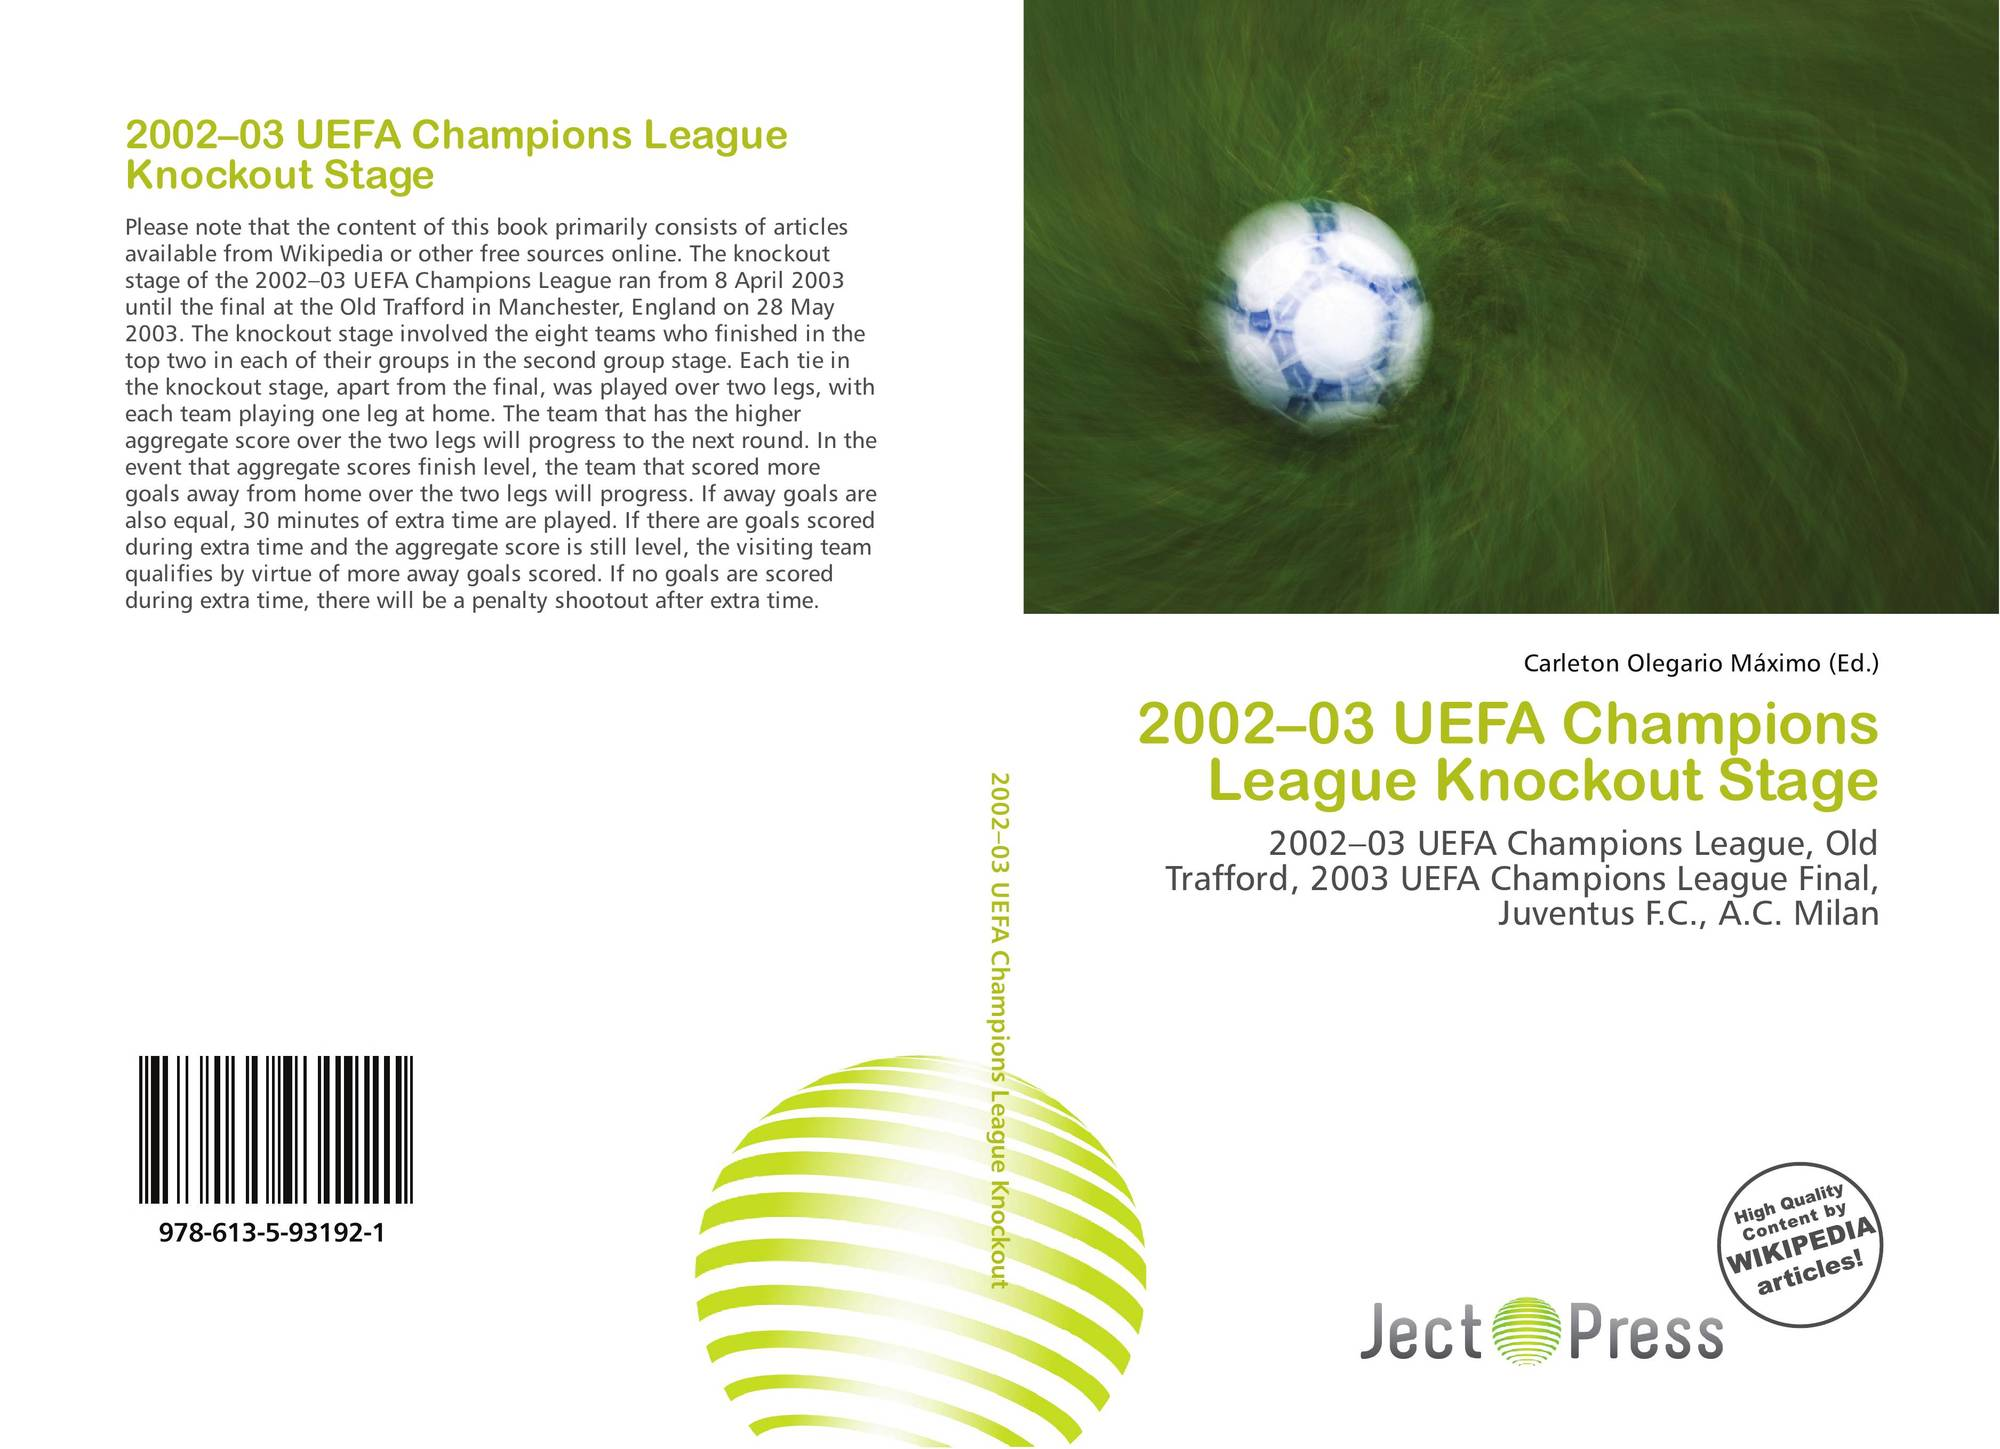 Champions League - Sky Sports Football